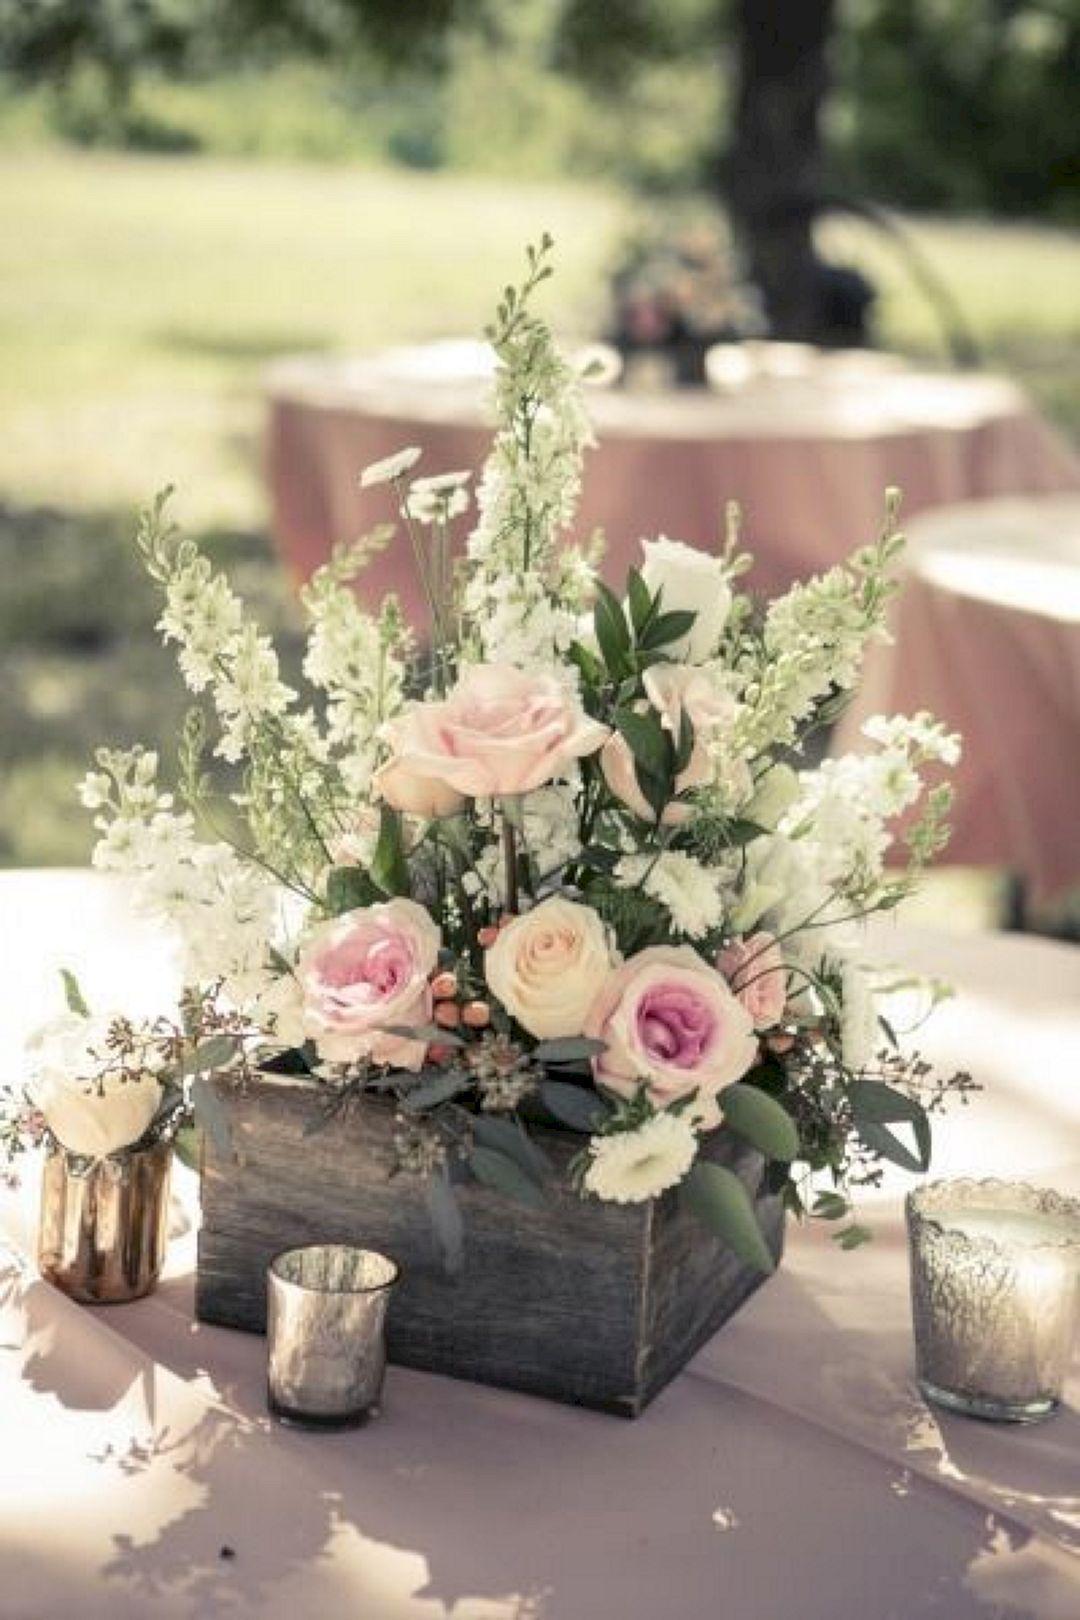 diy creative rustic chic wedding centerpieces ideas rustic chic